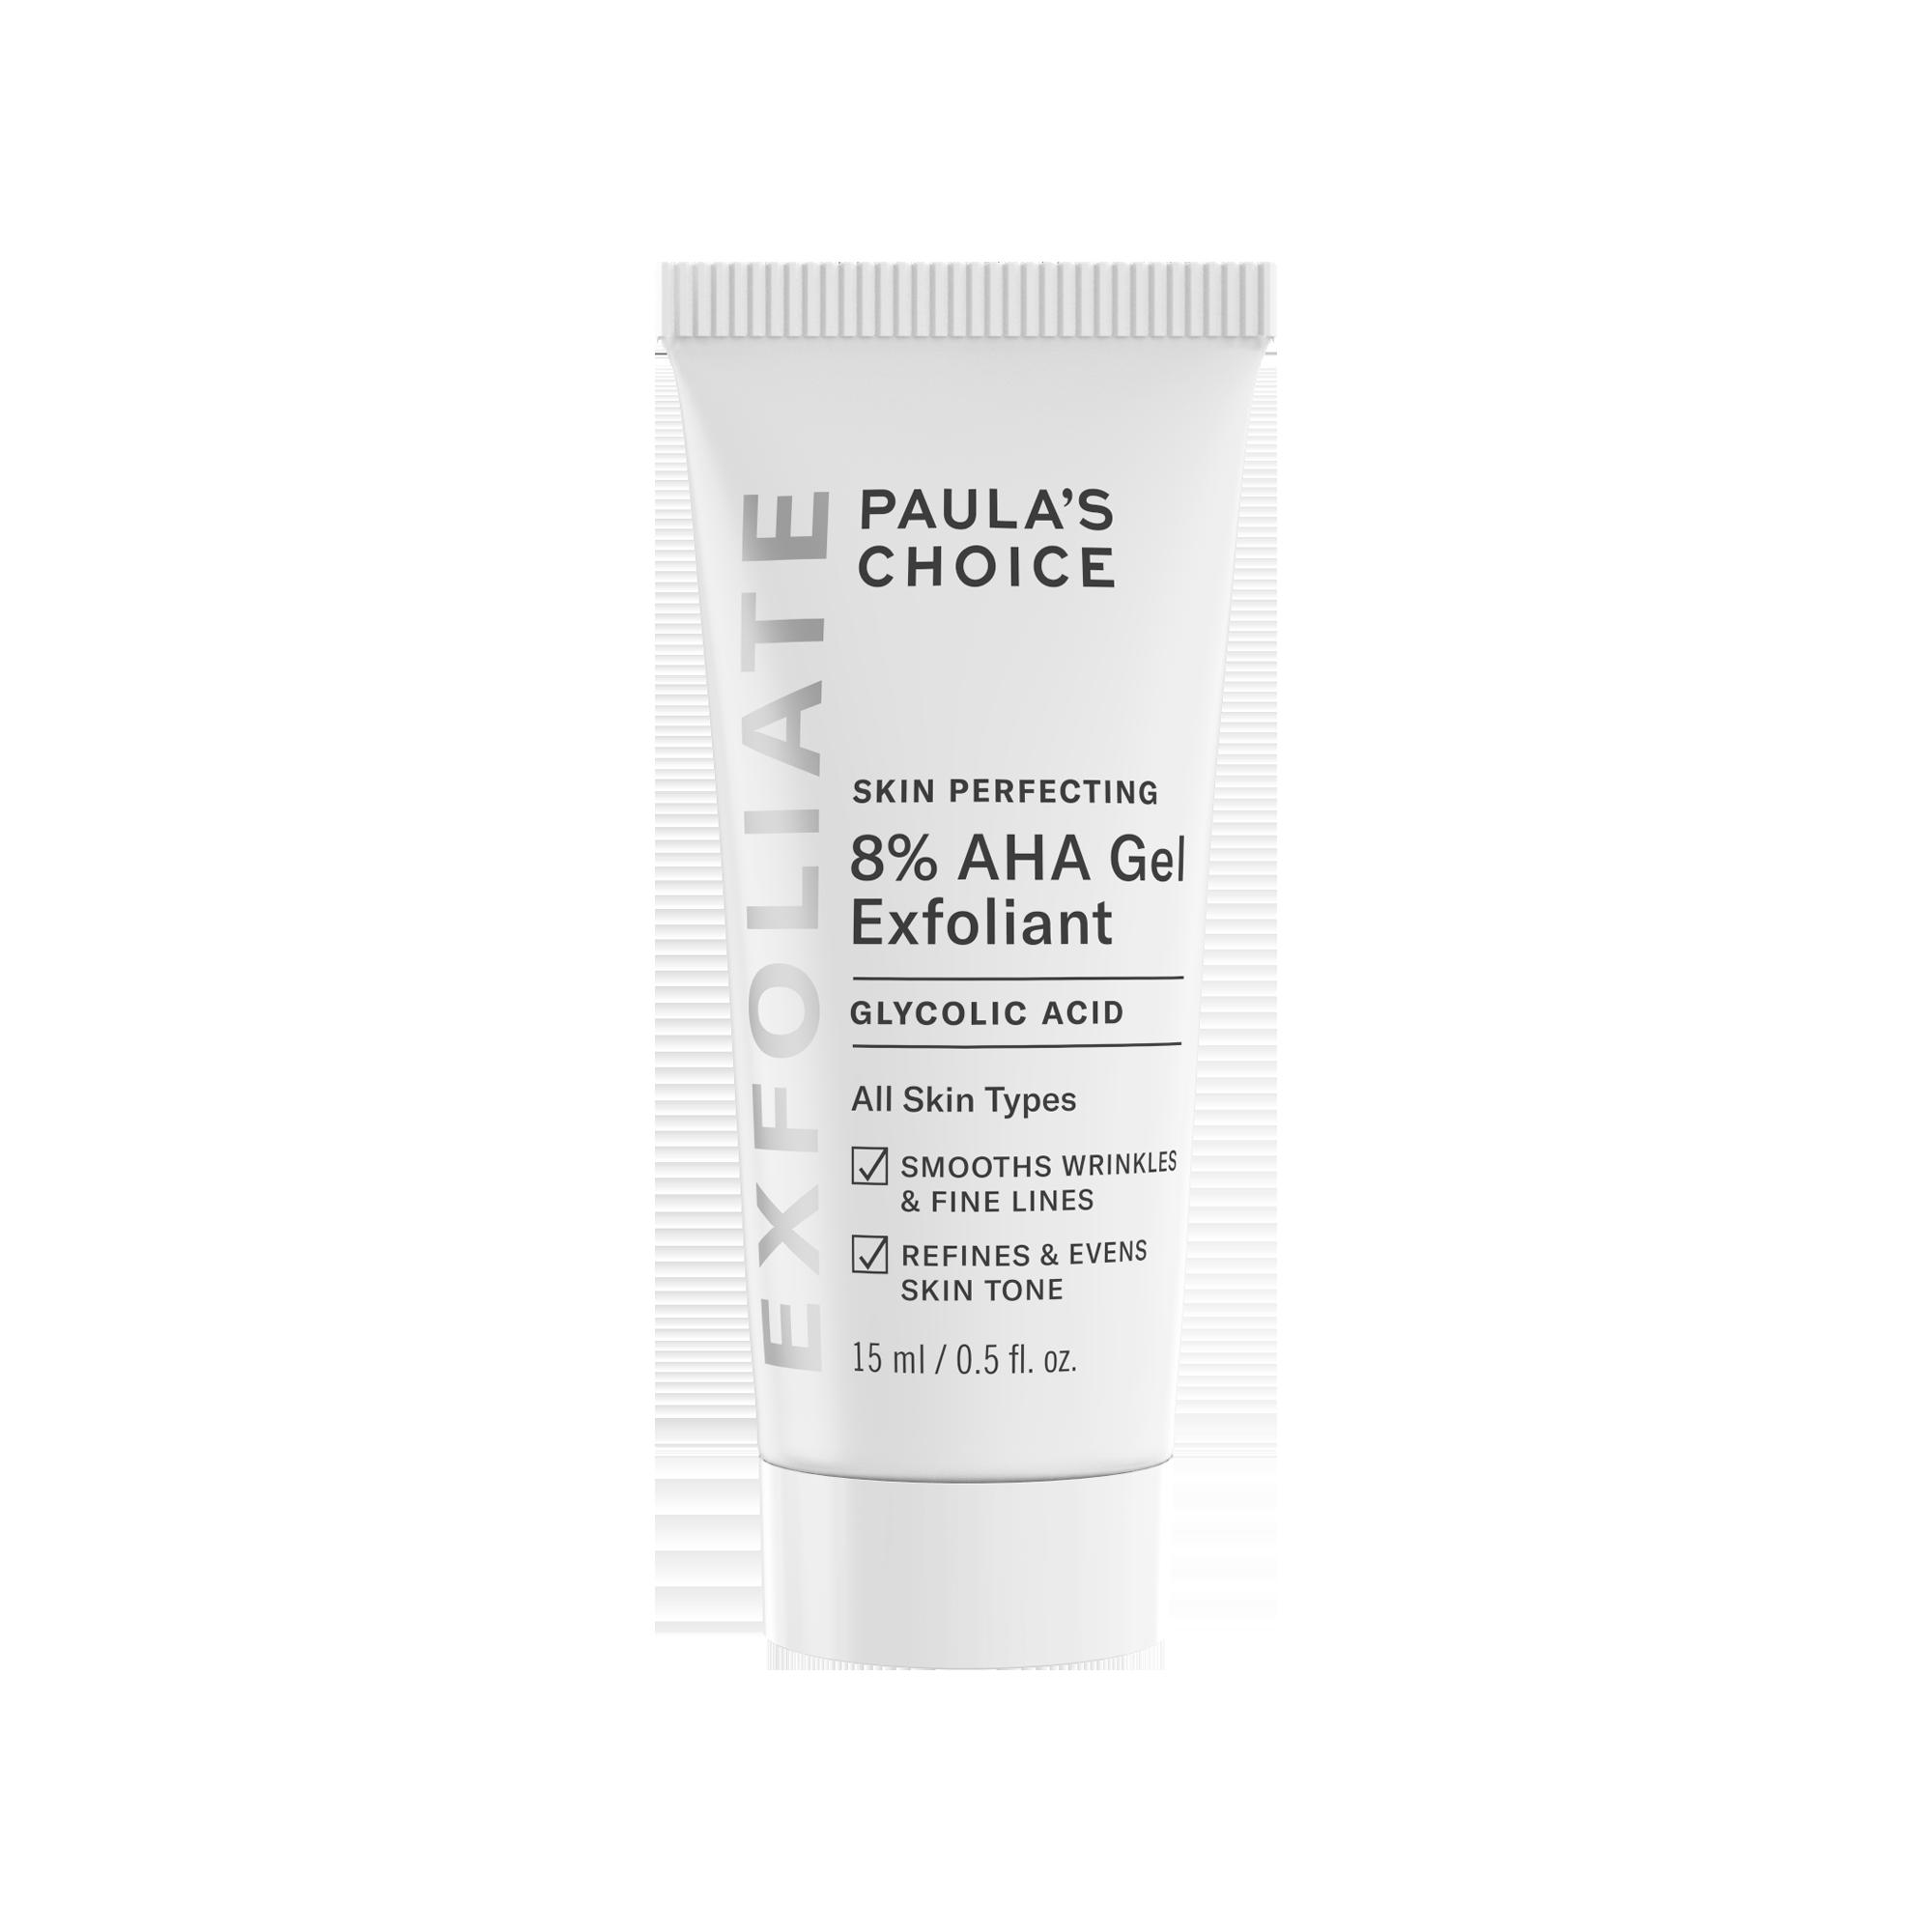 Skin Perfecting 8 Aha Gel Exfoliant Paula S Choice